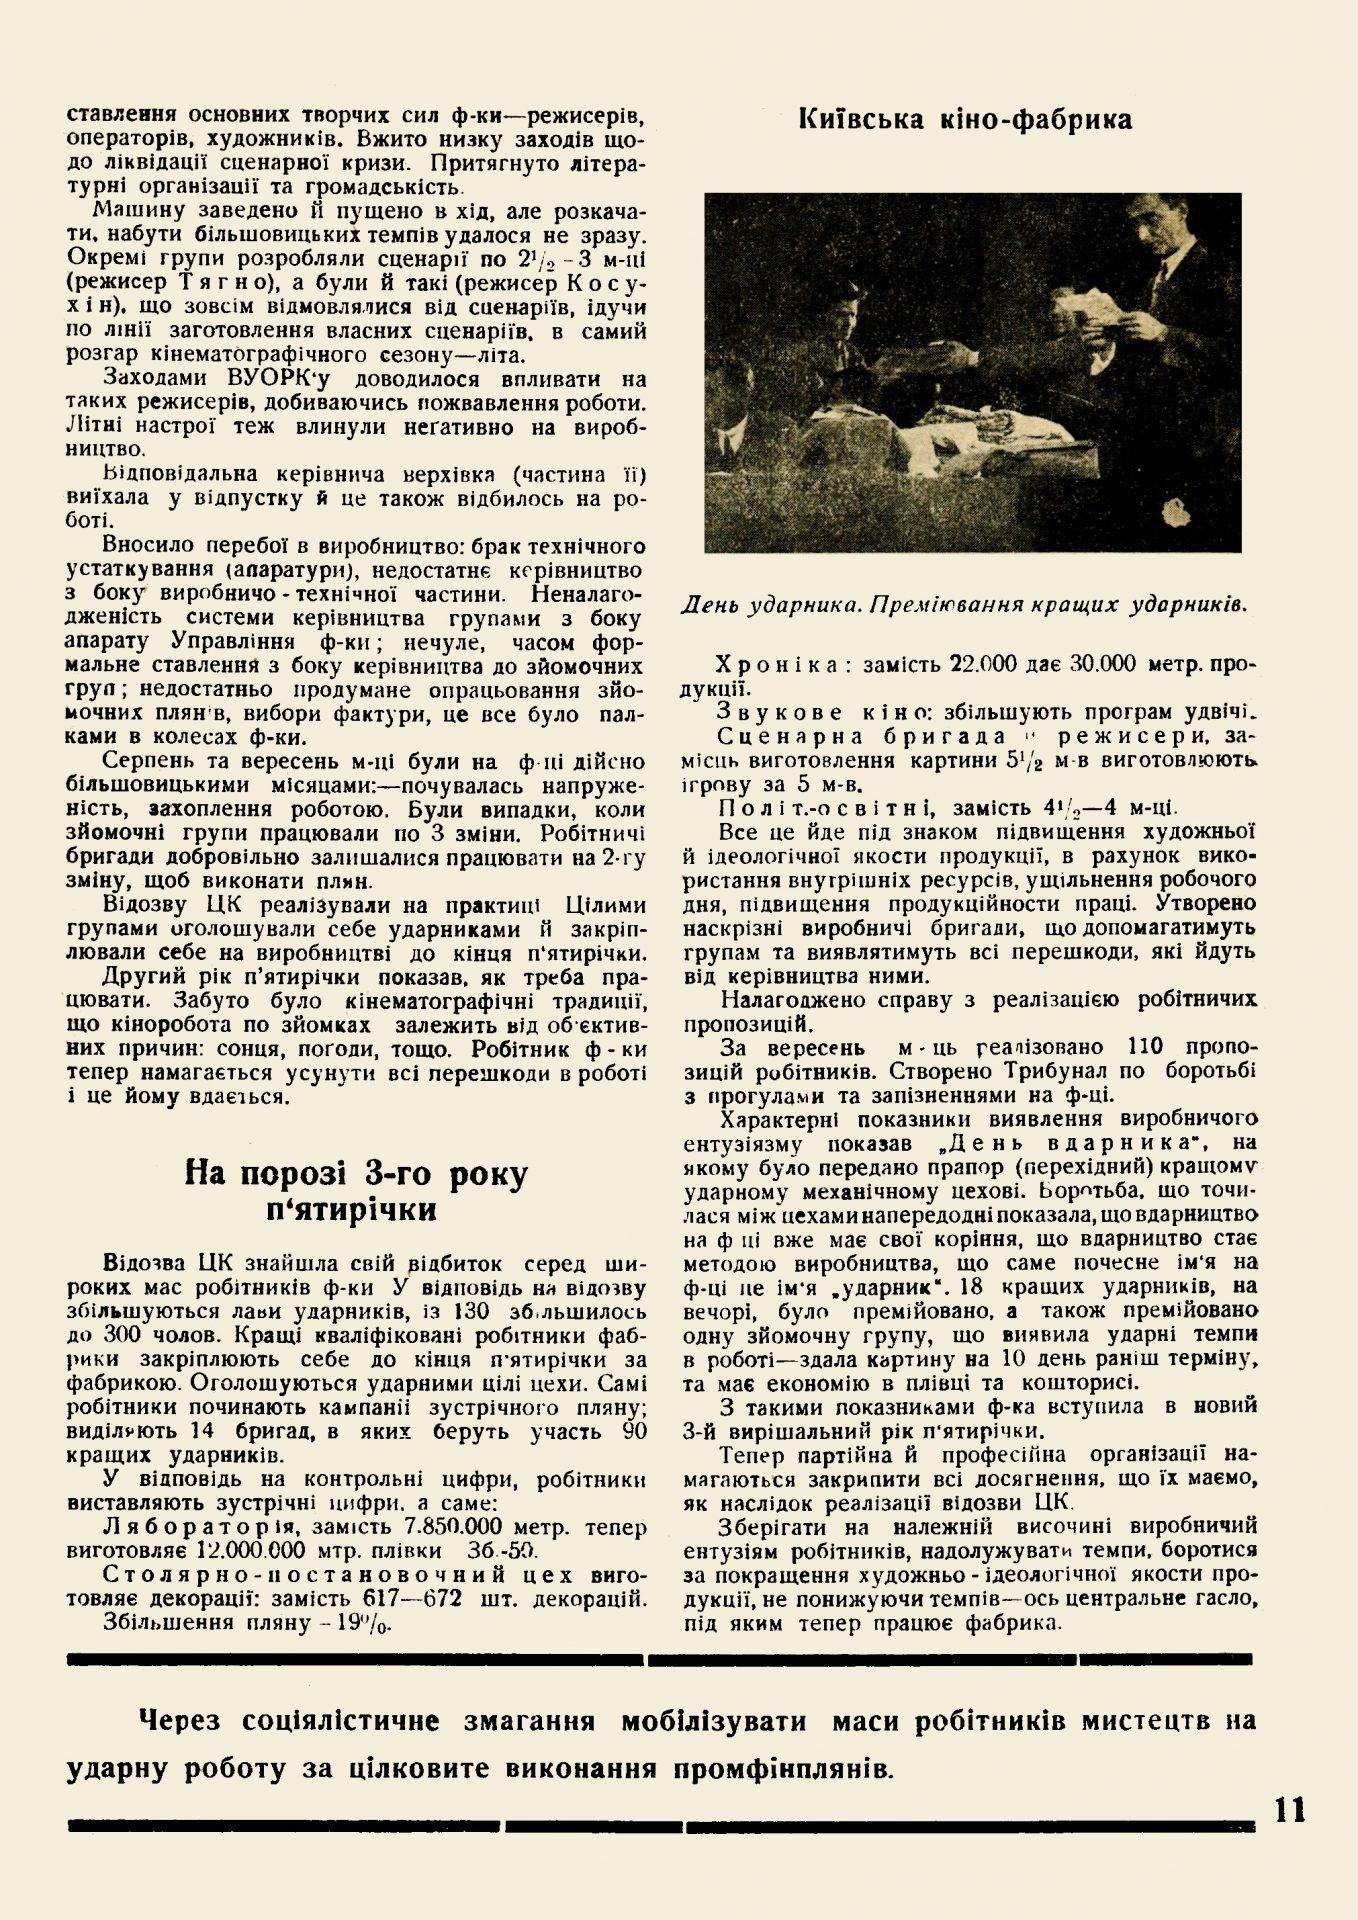 Мистецька трибуна_1930_№ 20-21